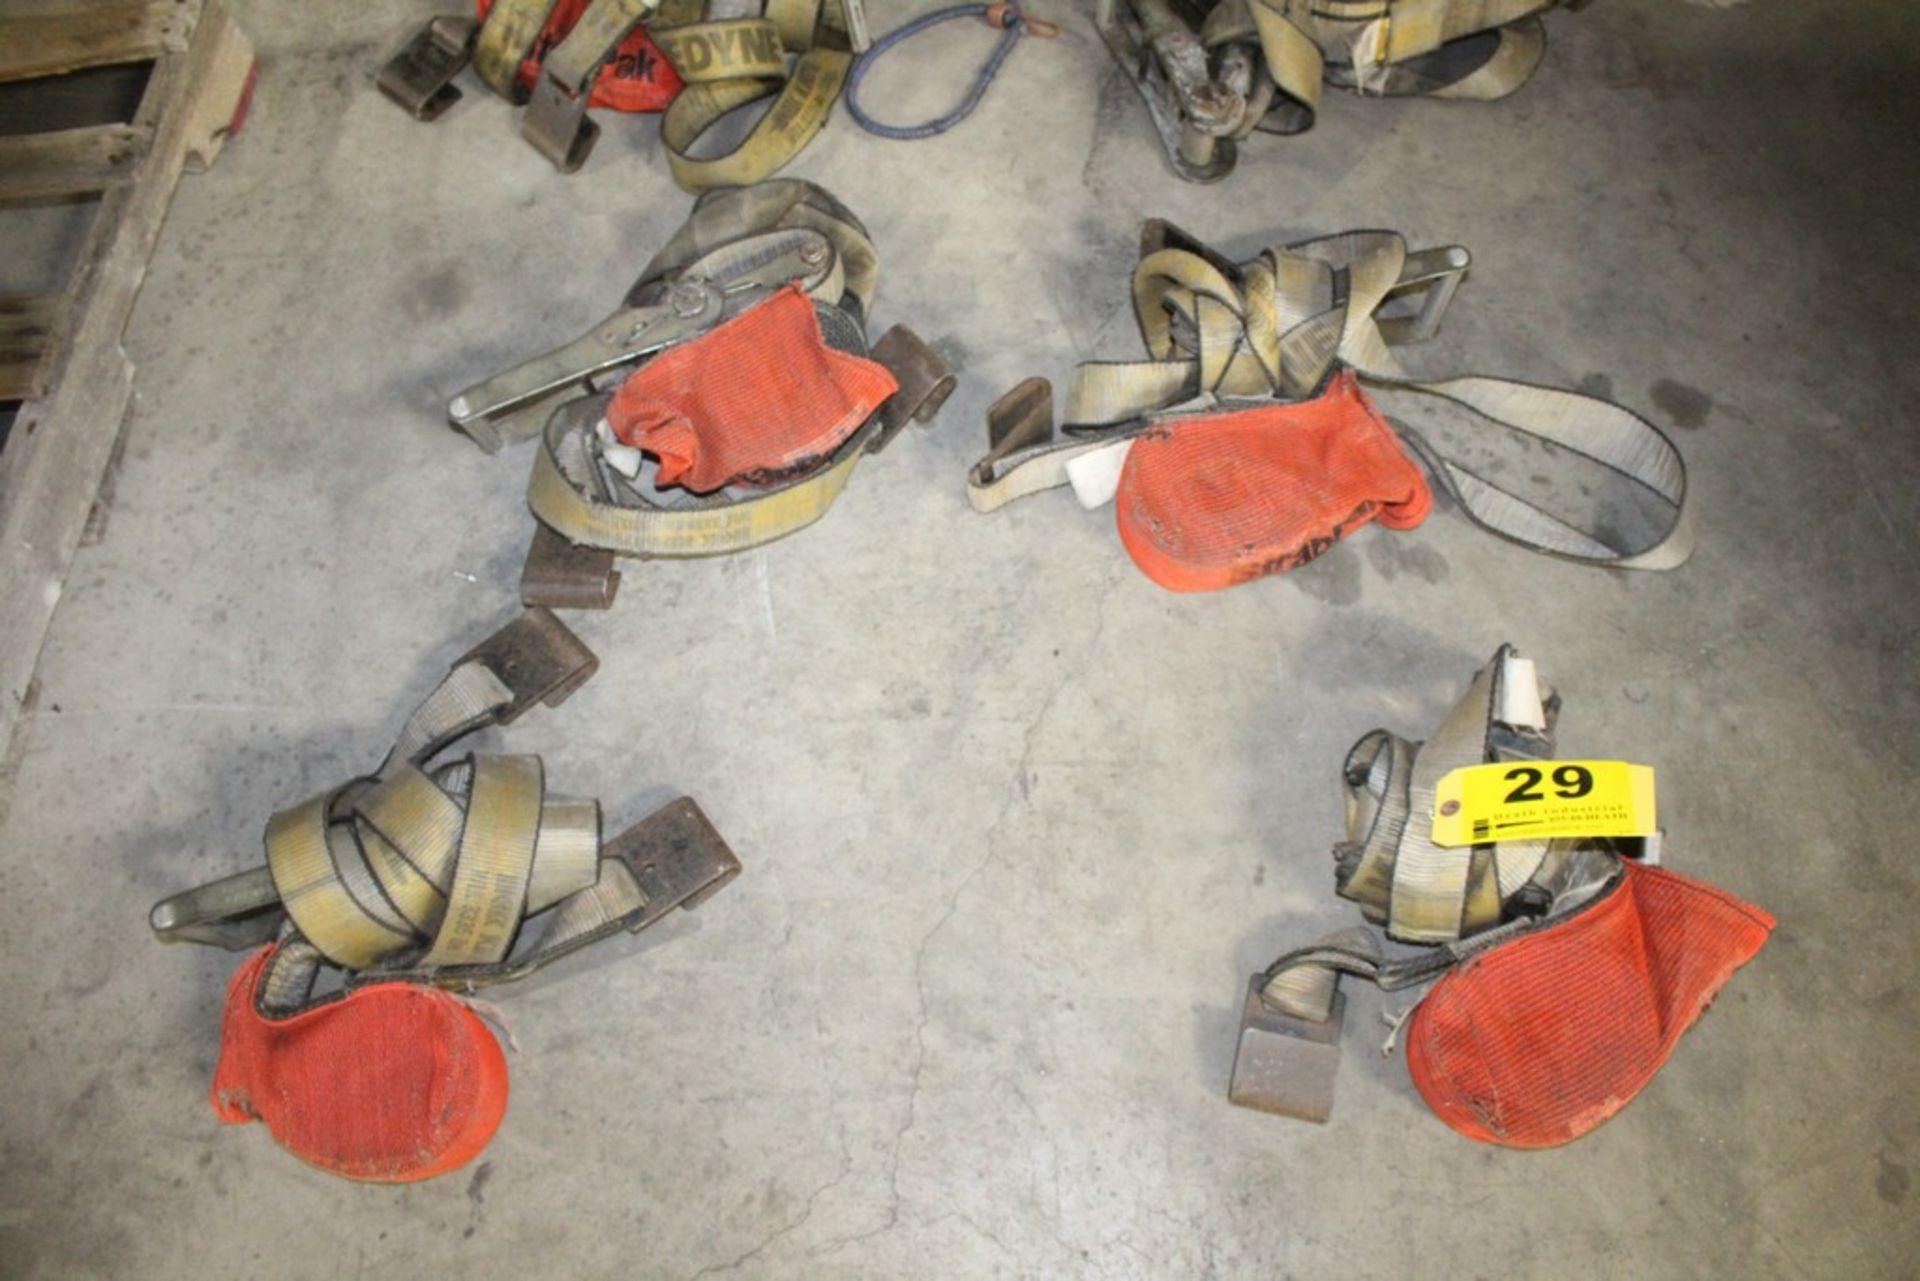 Rachet & Tie Down Straps - (8) Total Complete Pieces - Image 4 of 4